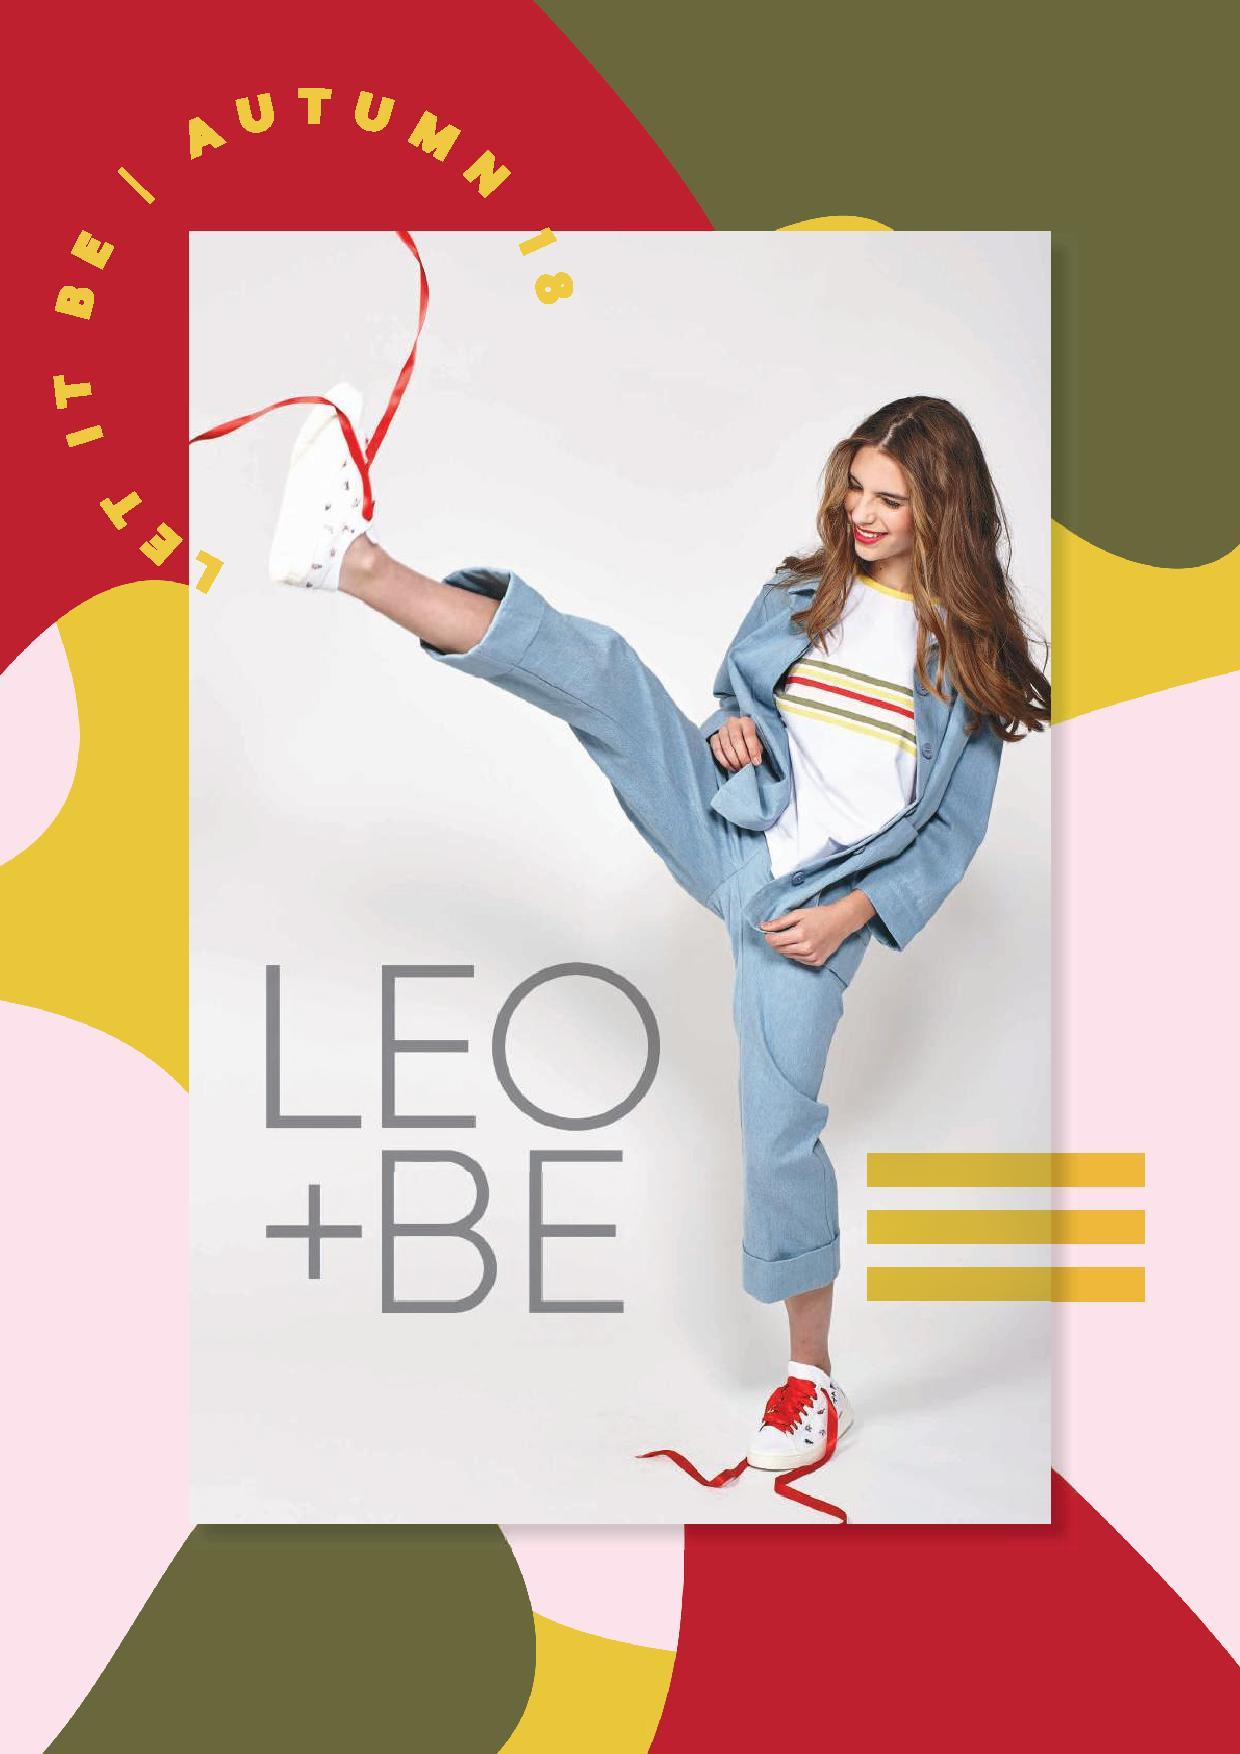 LEO+BE Autumn 2018 lookbook-page-001